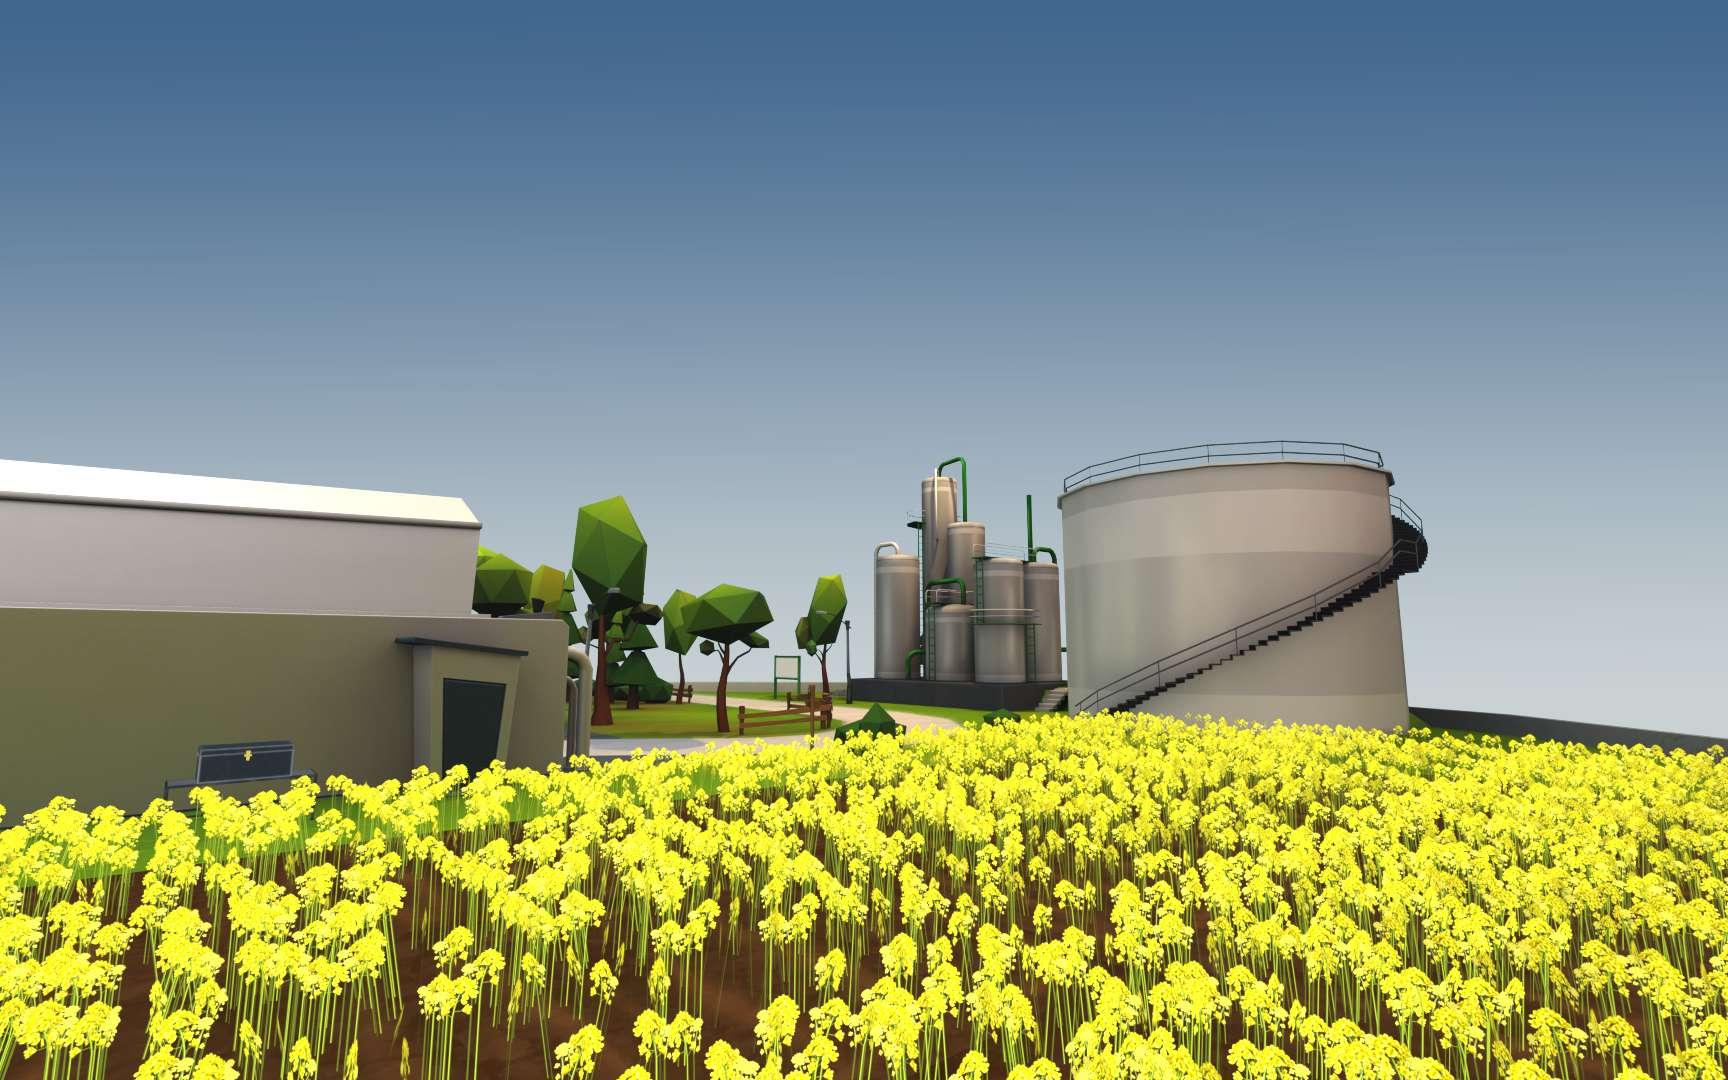 Le Mooc Transition Energétique de l'IFP School permet d'explorer des univers virtuels en 3D. © IFP School